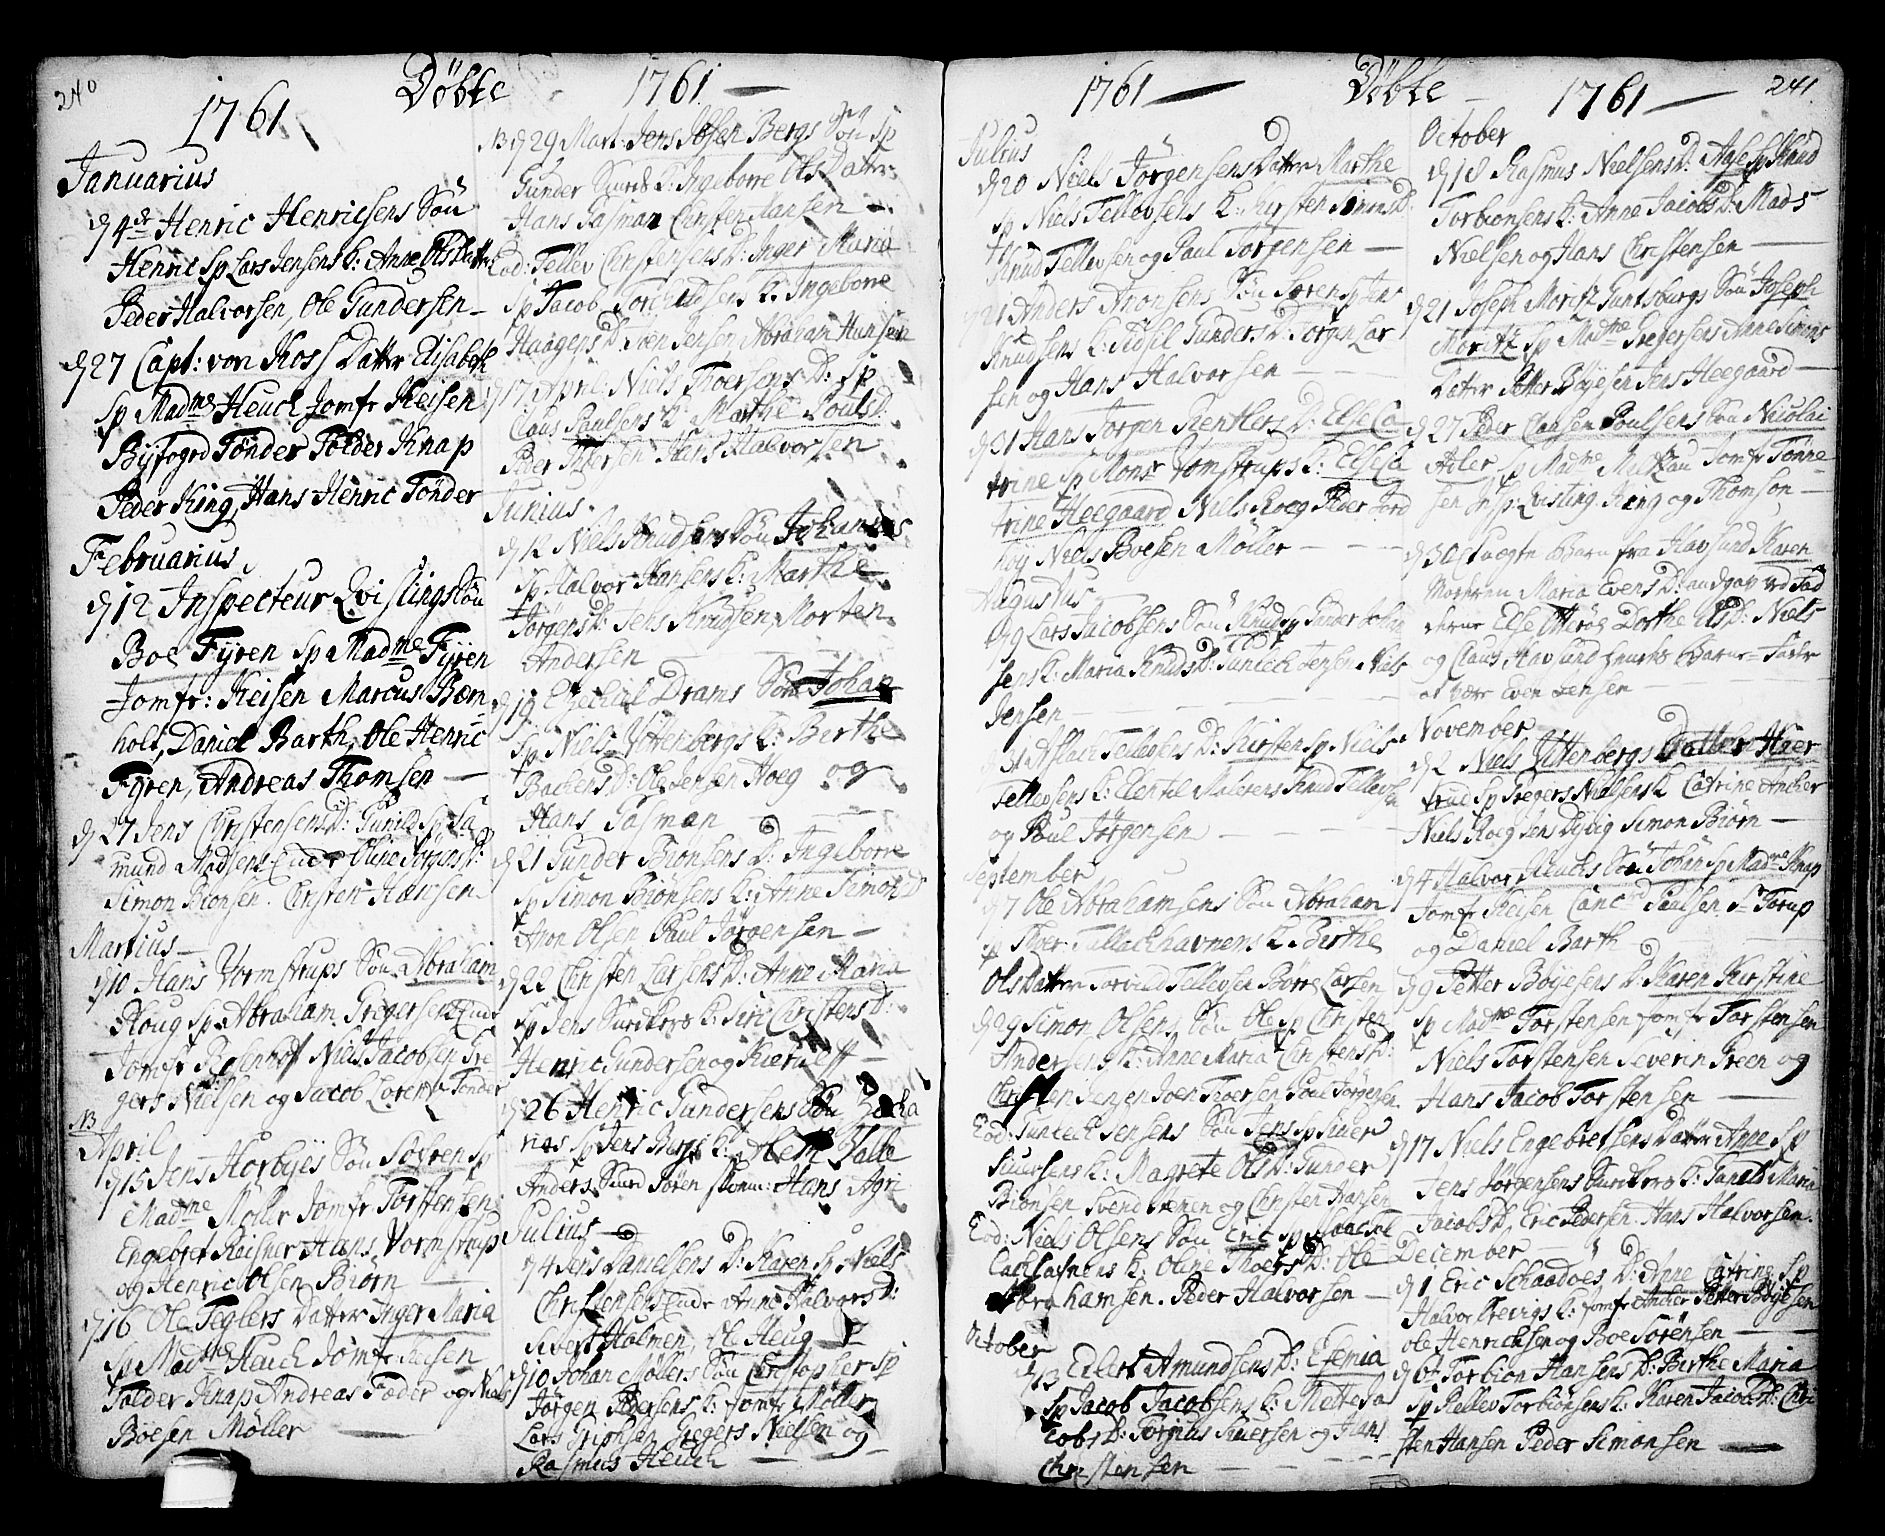 SAKO, Kragerø kirkebøker, F/Fa/L0001: Ministerialbok nr. 1, 1702-1766, s. 240-241